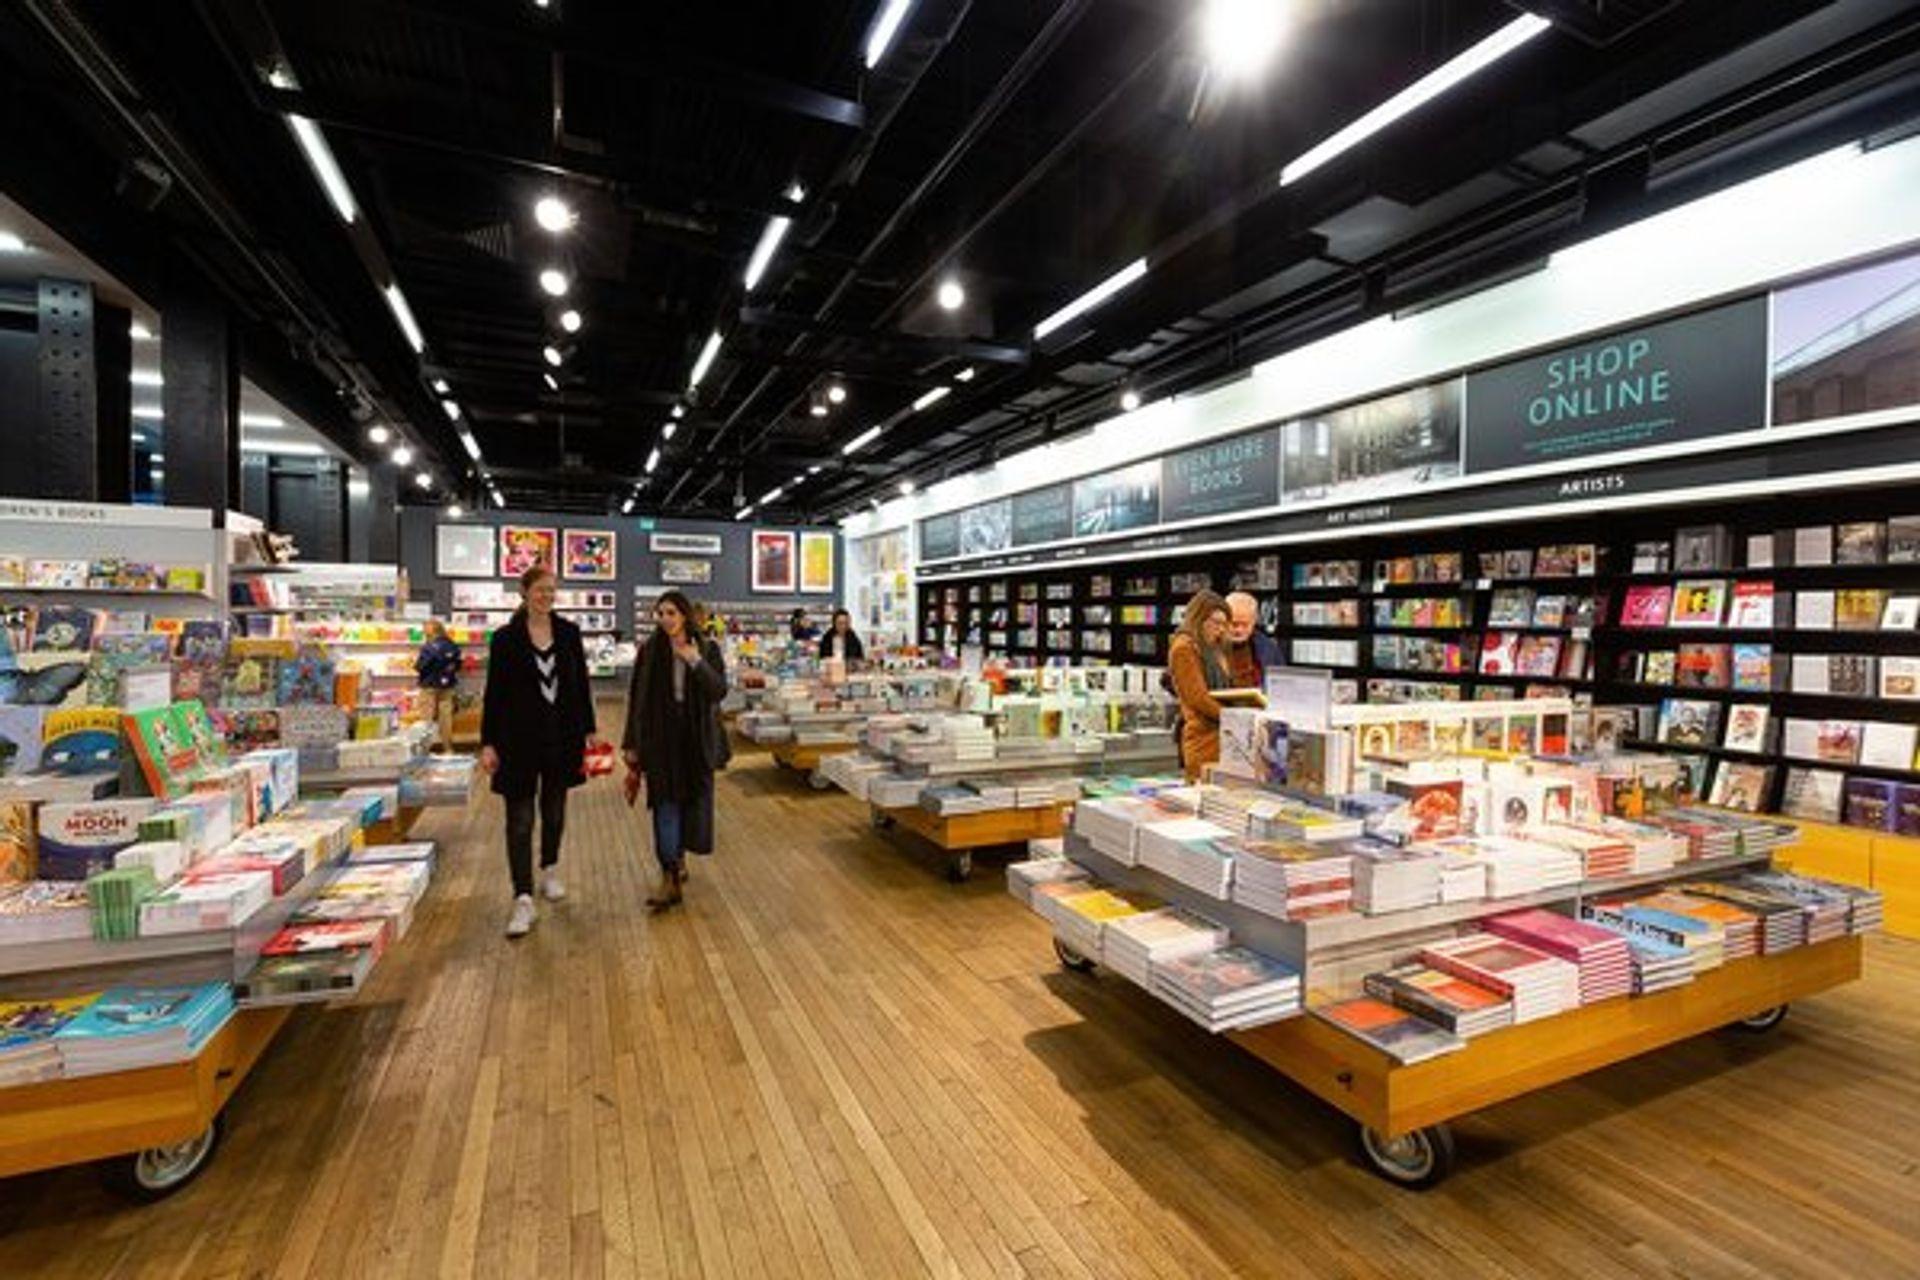 The Turbine Hall book shop at Tate Modern